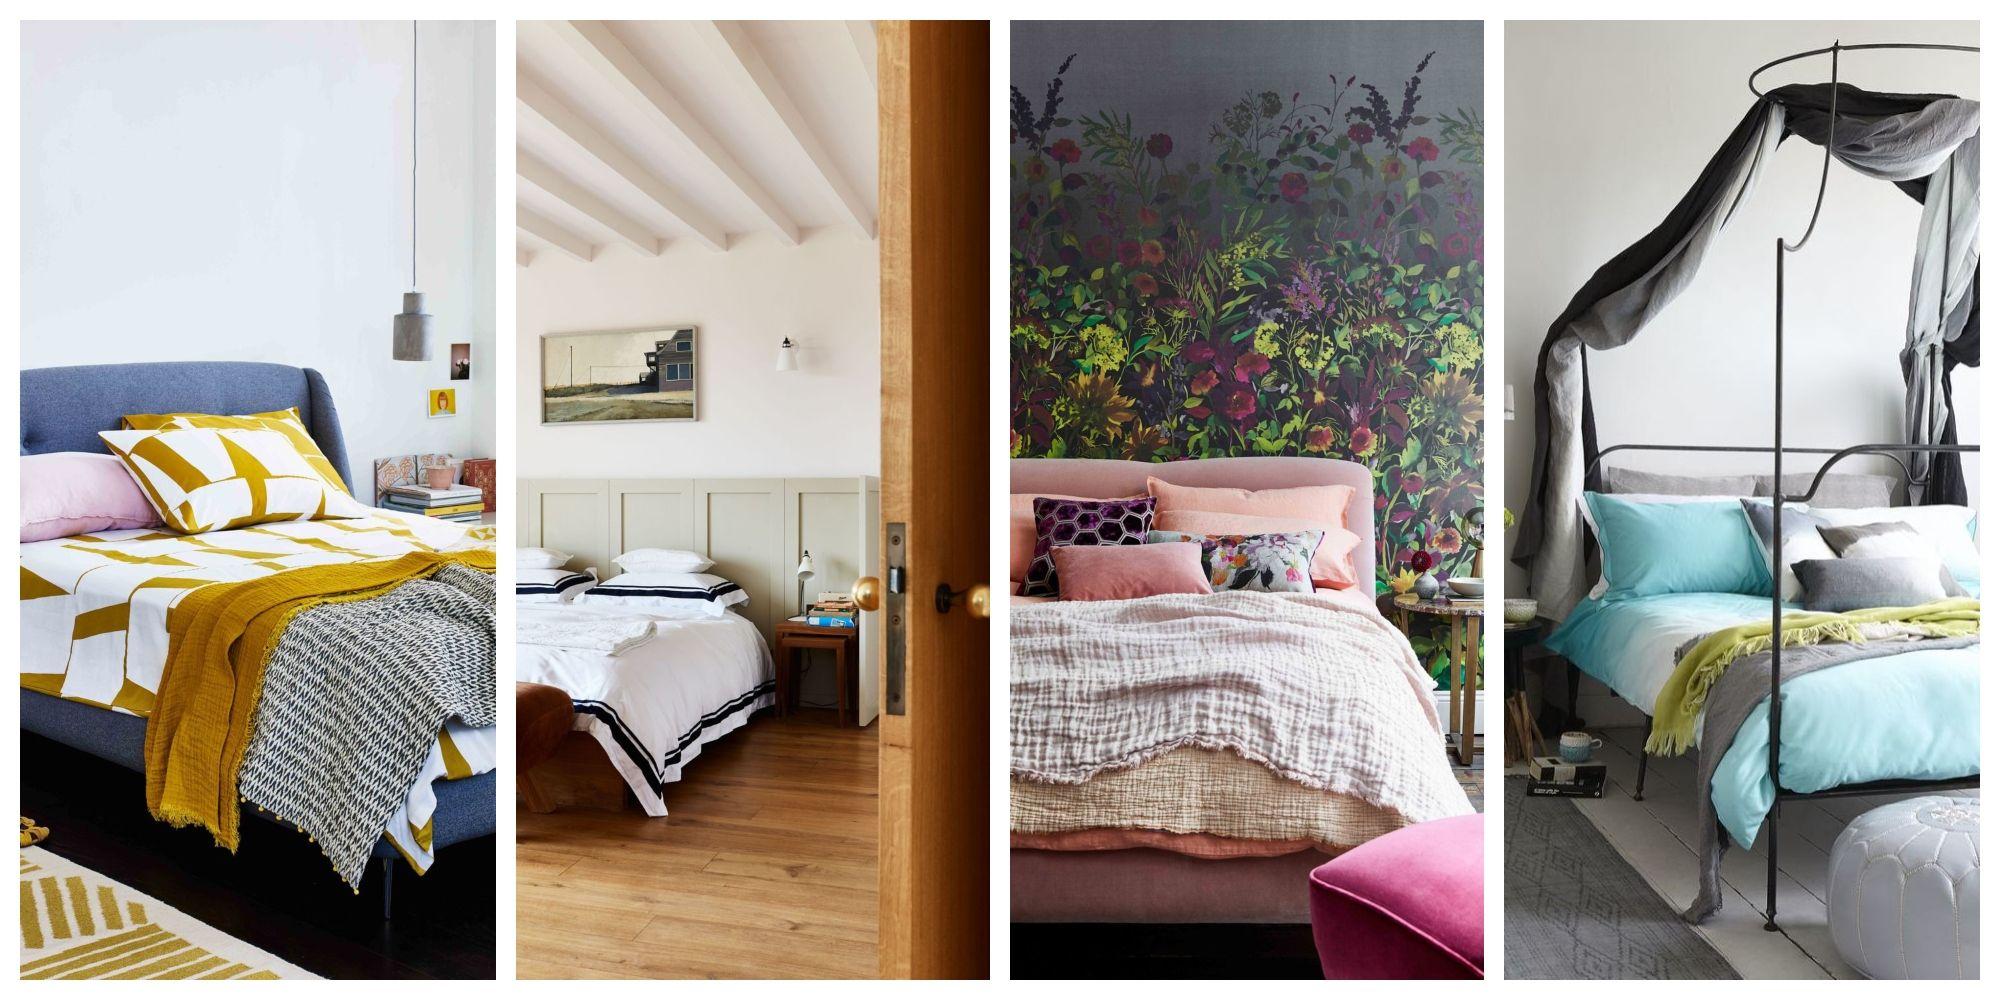 bedroom furnishing designs blogs workanyware co uk u2022 rh blogs workanyware co uk